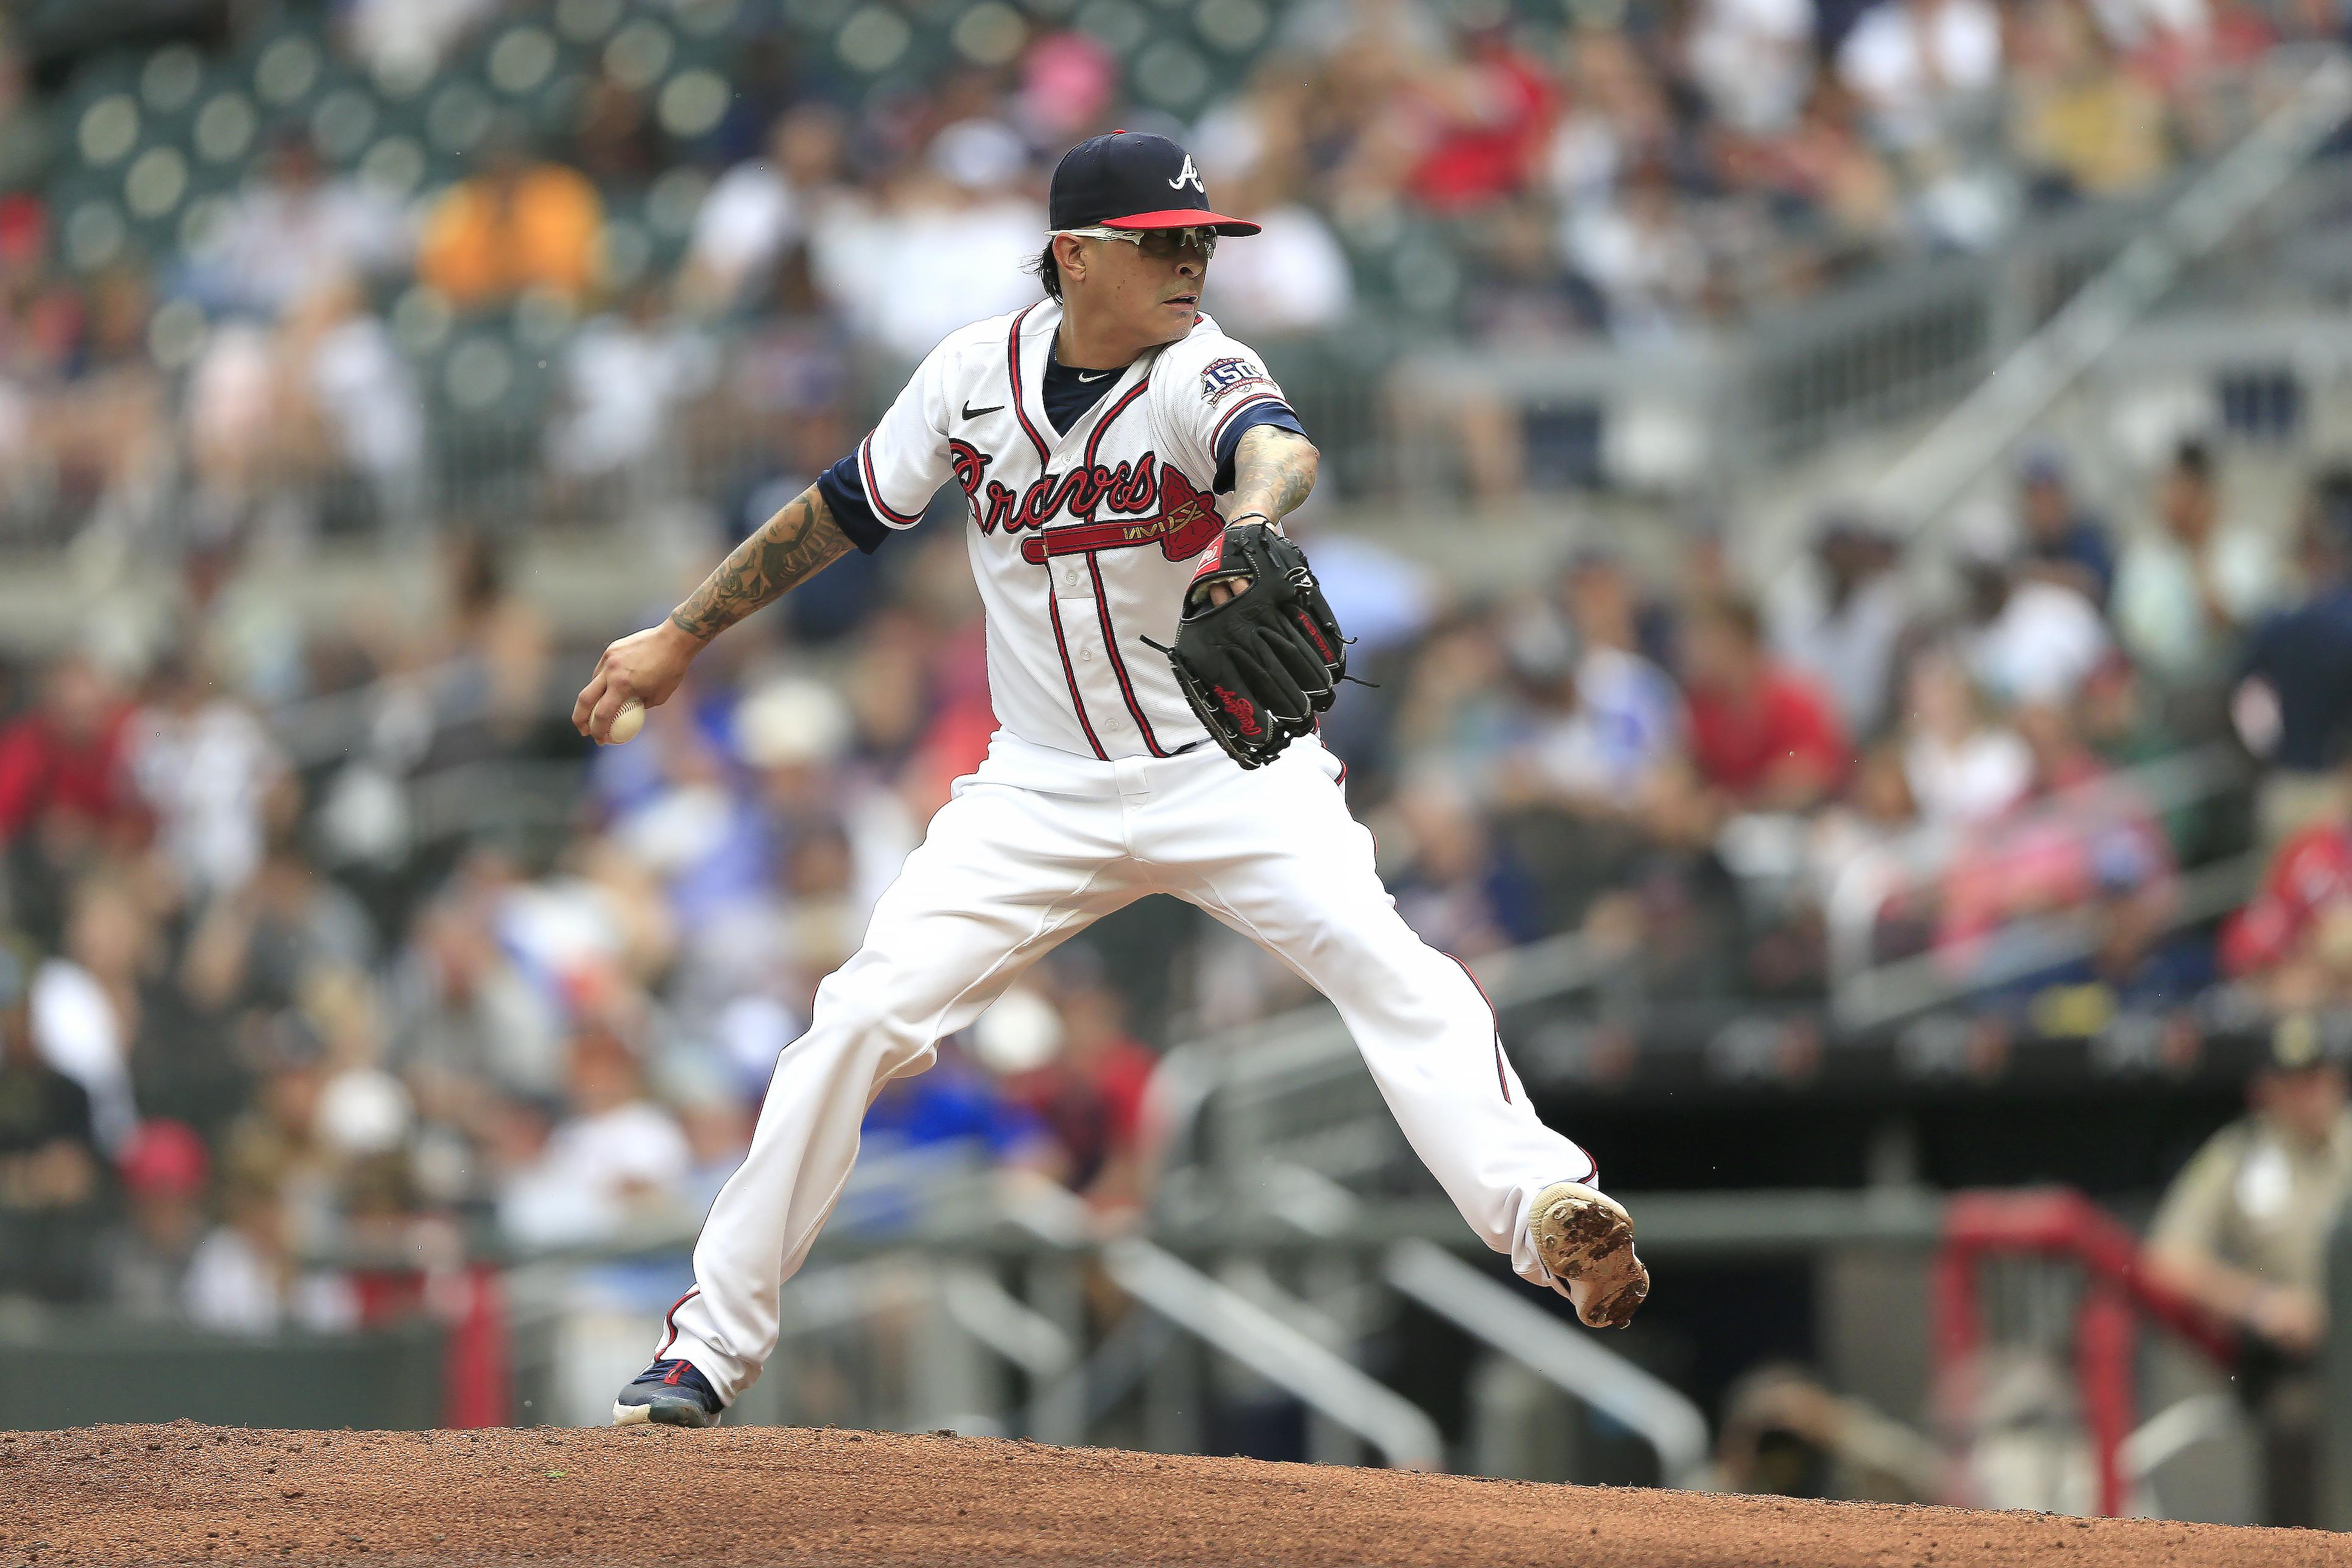 MLB: JUL 21 Padres at Braves Game 1